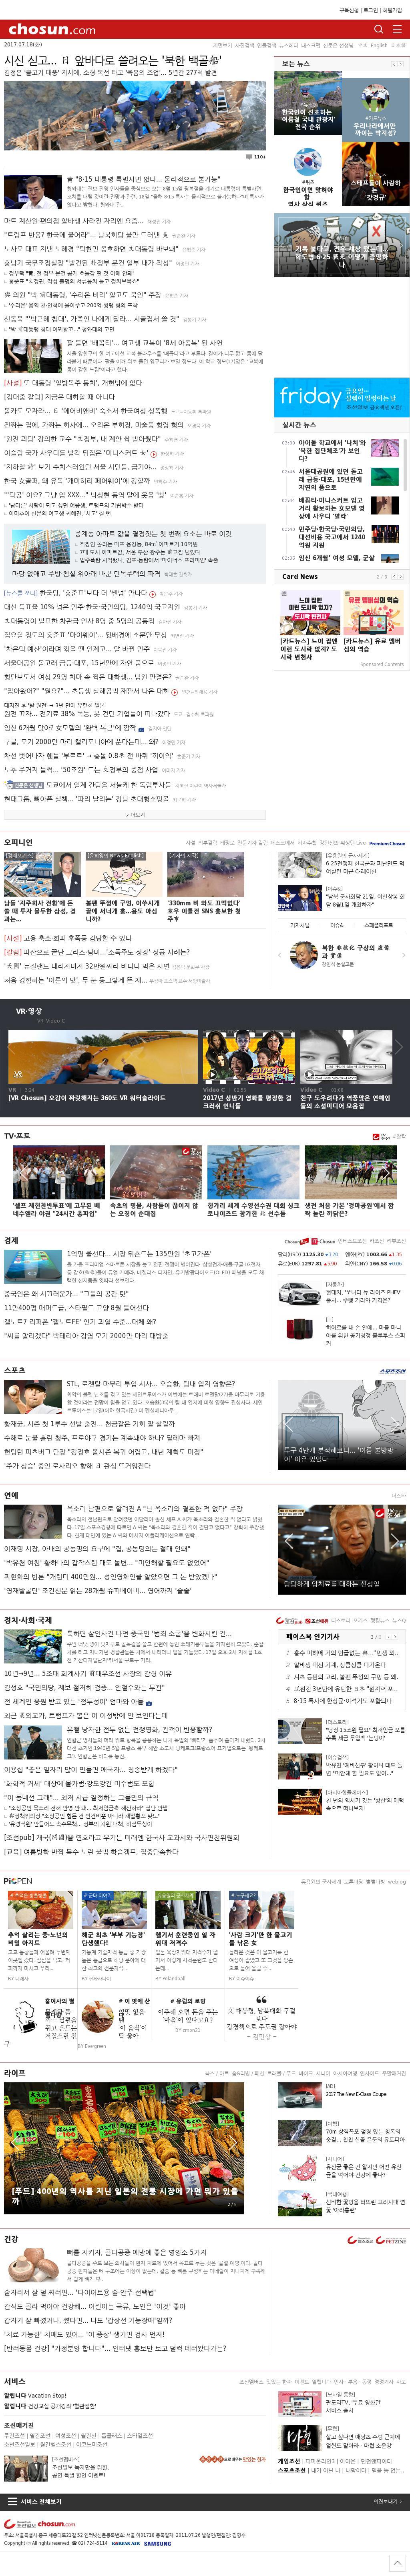 chosun.com at Tuesday July 18, 2017, 3:01 a.m. UTC